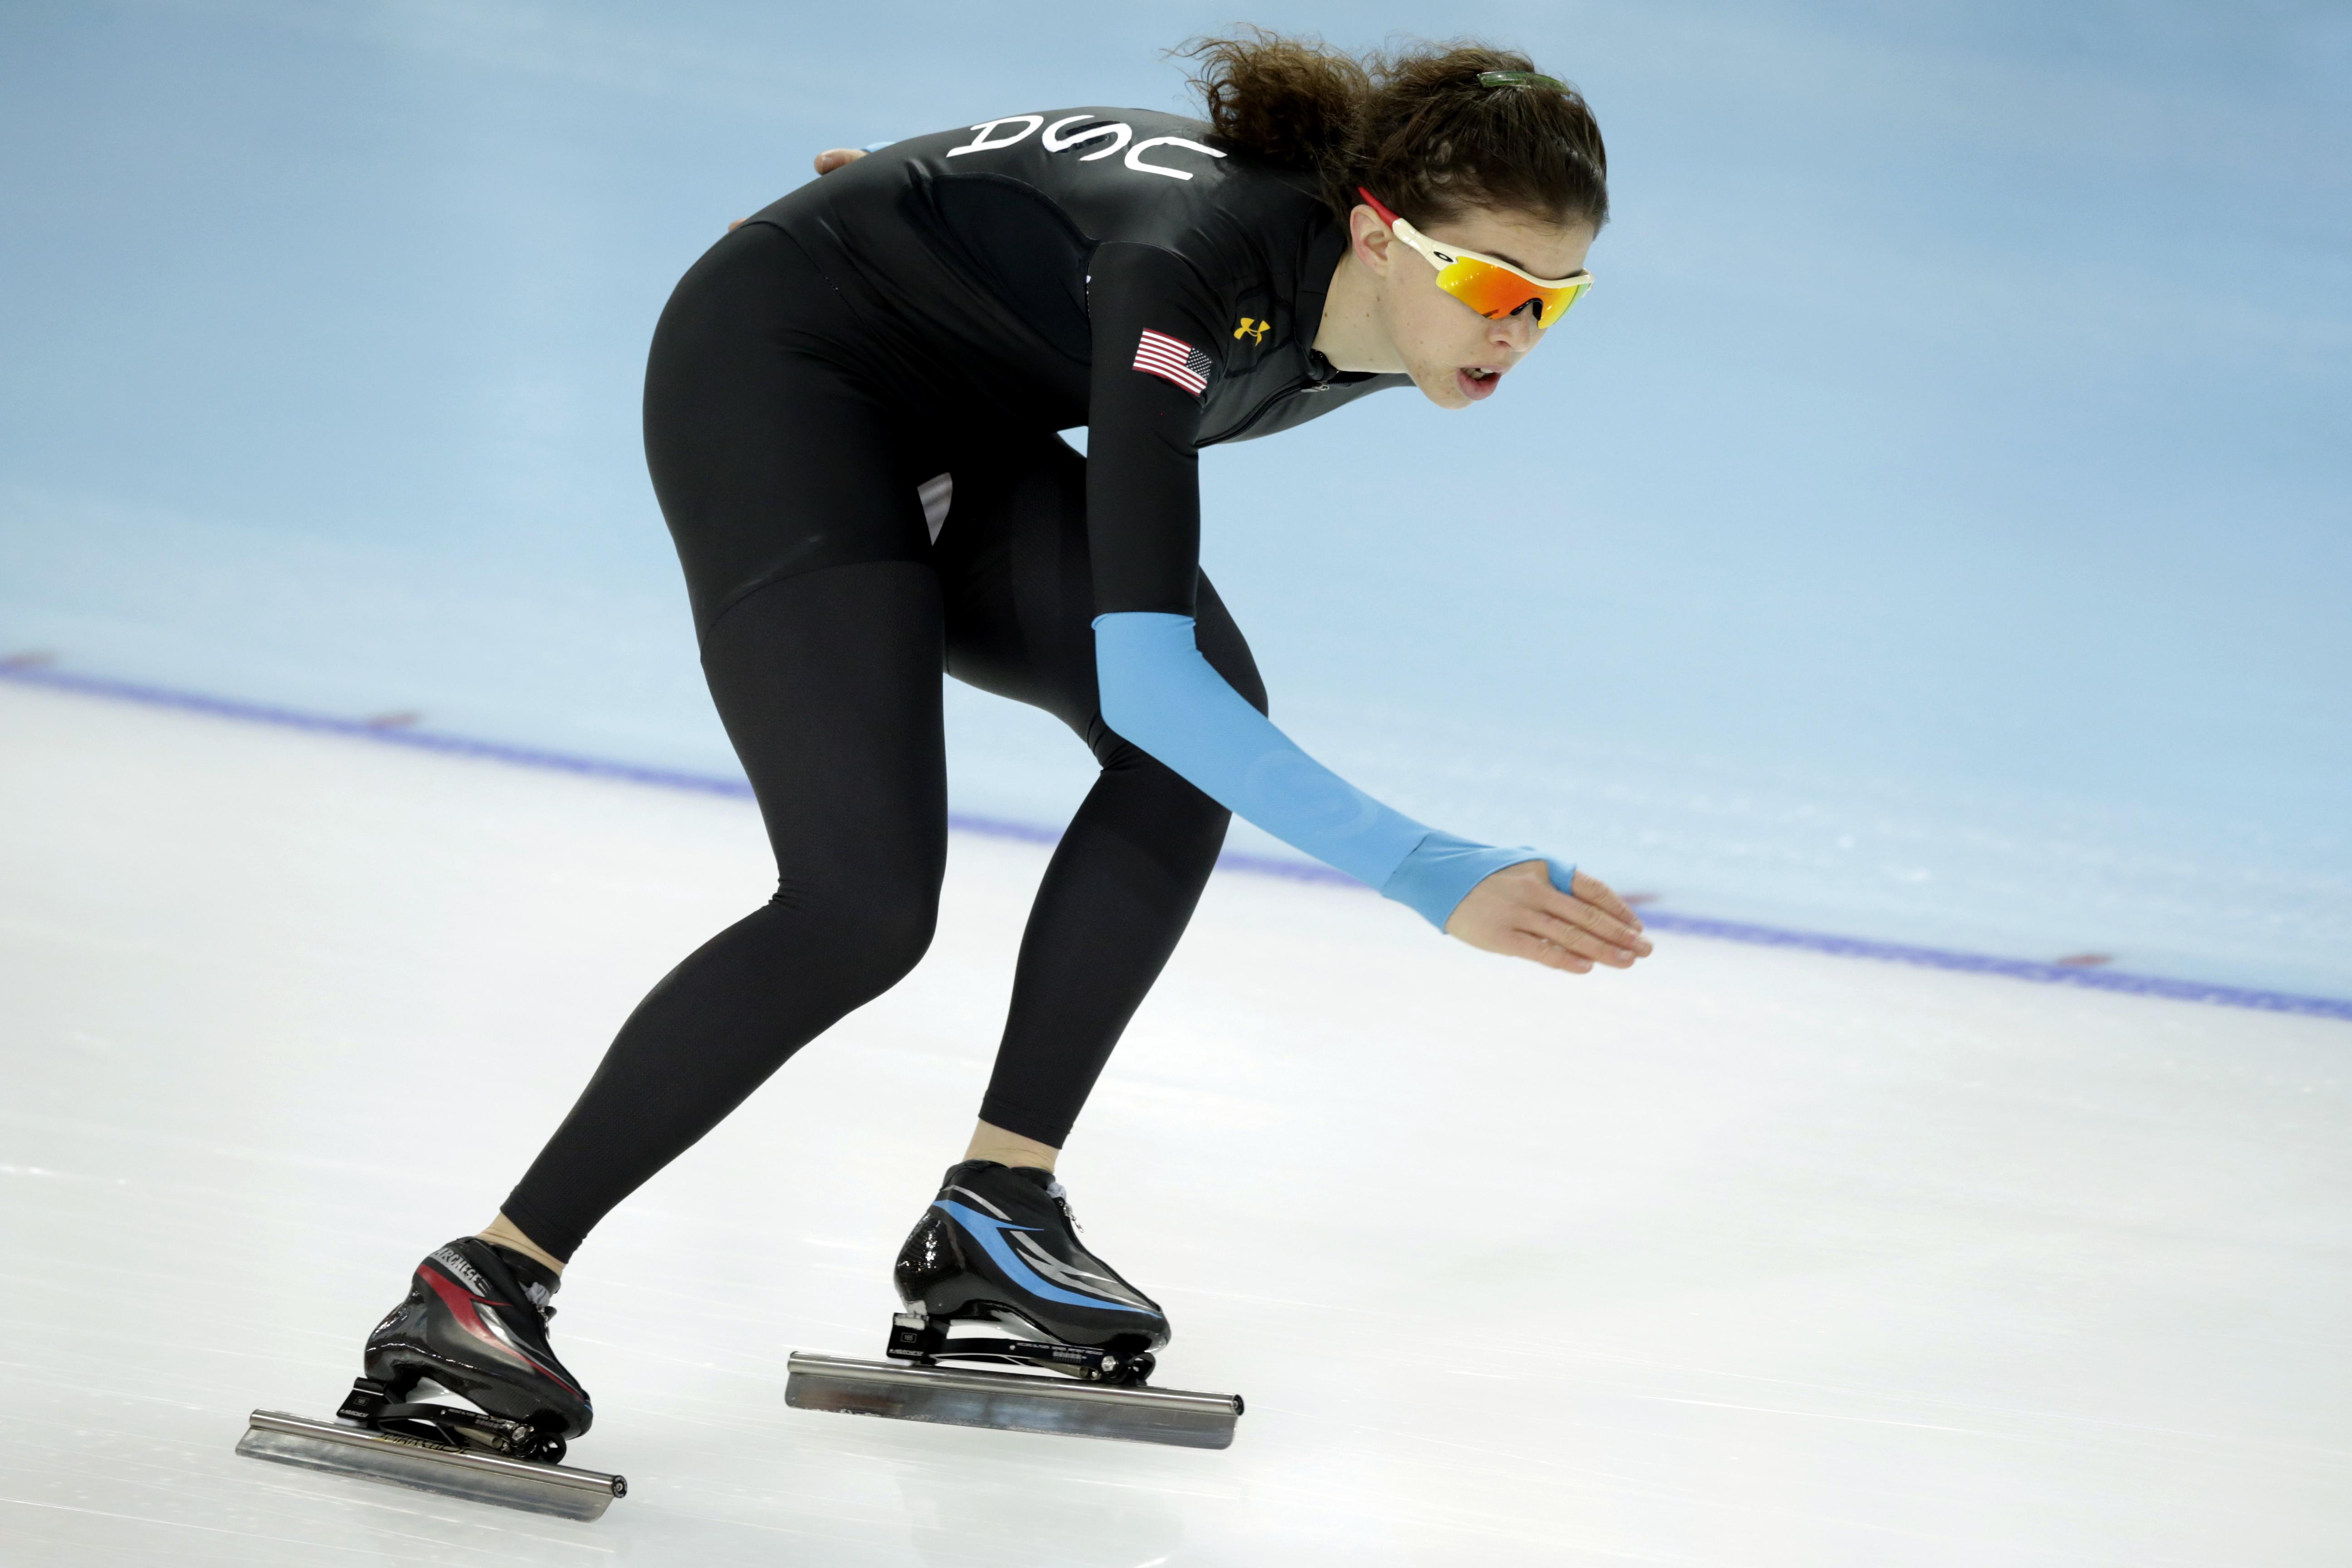 Speedskater Maria Lamb of the U.S. trains at the Adler Arena Skating Center during the 2014 Winter Olympics, Tuesday, Feb. 18, 2014, in Sochi, Russia. (AP Photo/Matt Dunham)